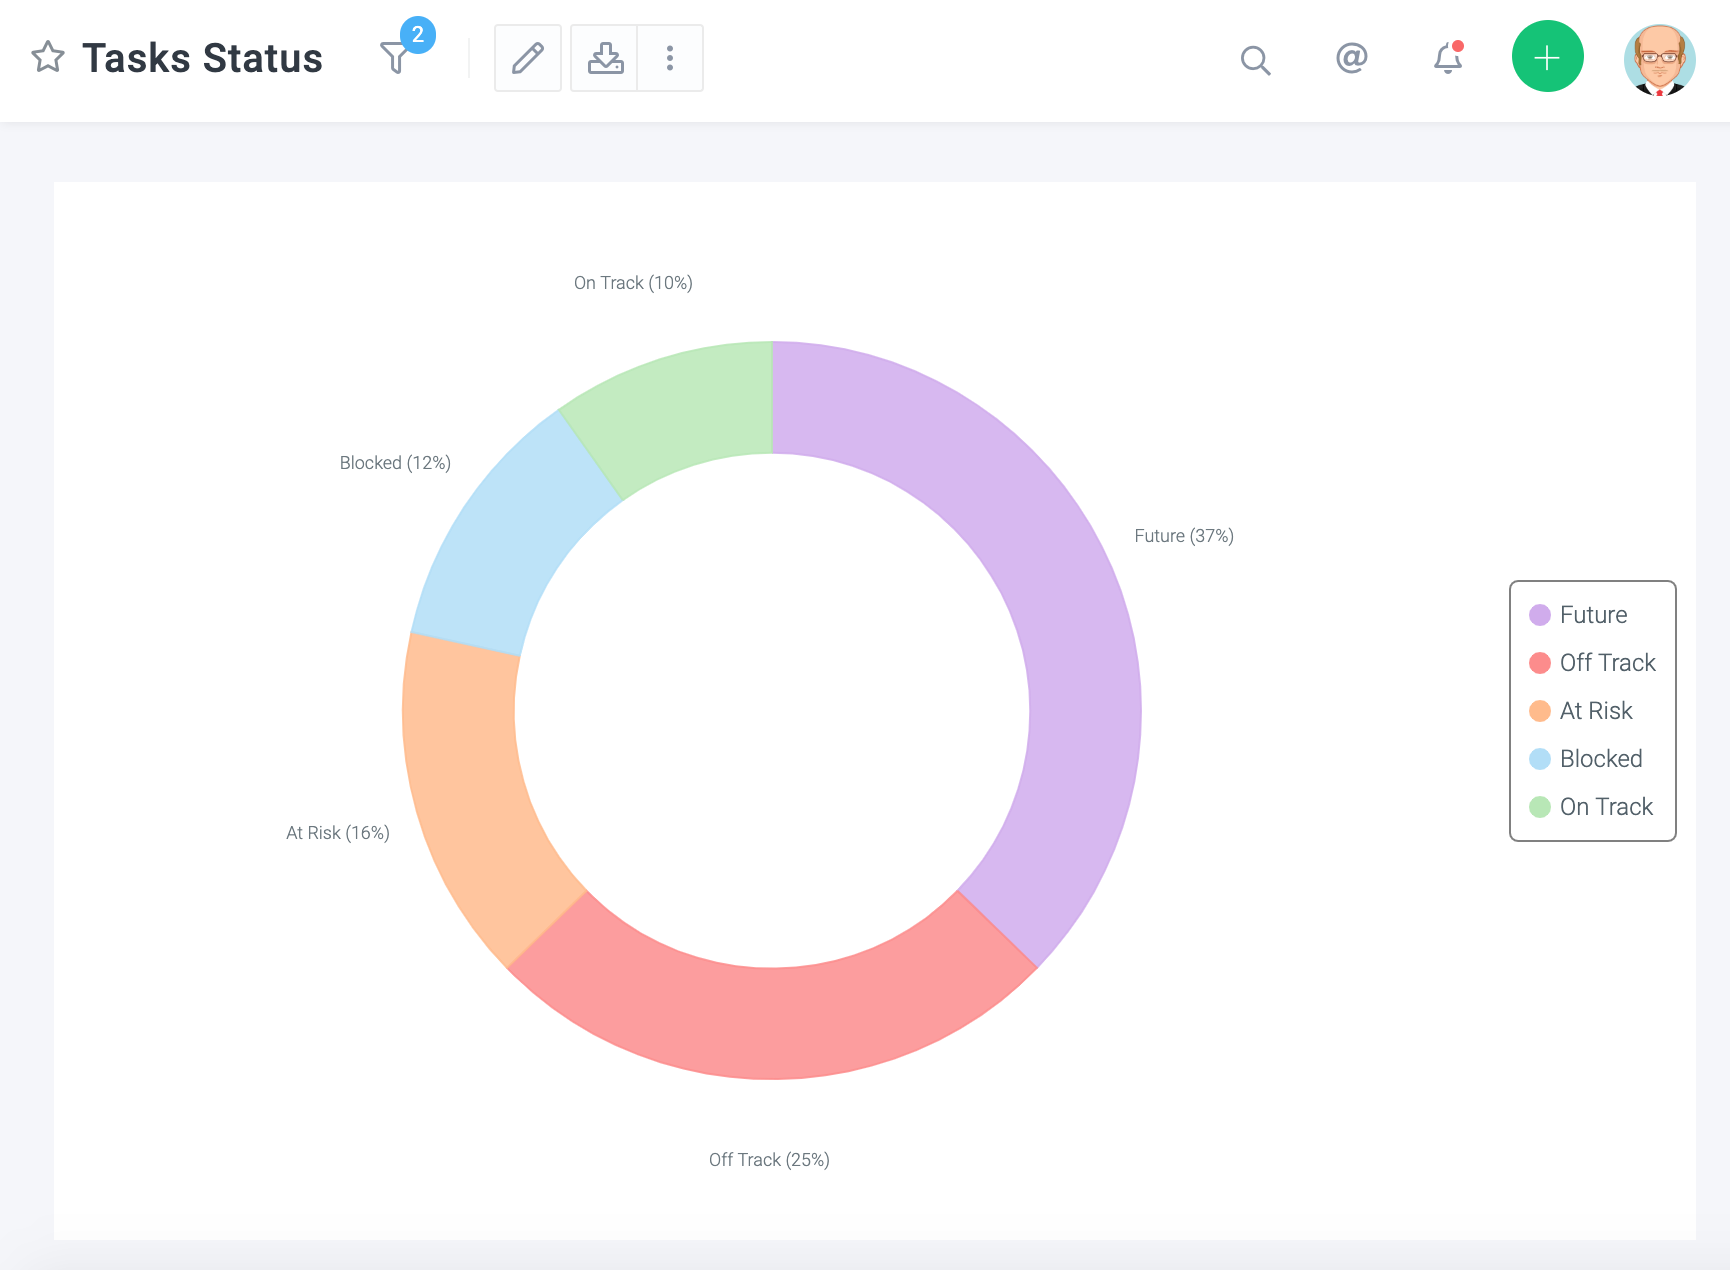 Celoxis Software - Tasks Status - Pie Chart